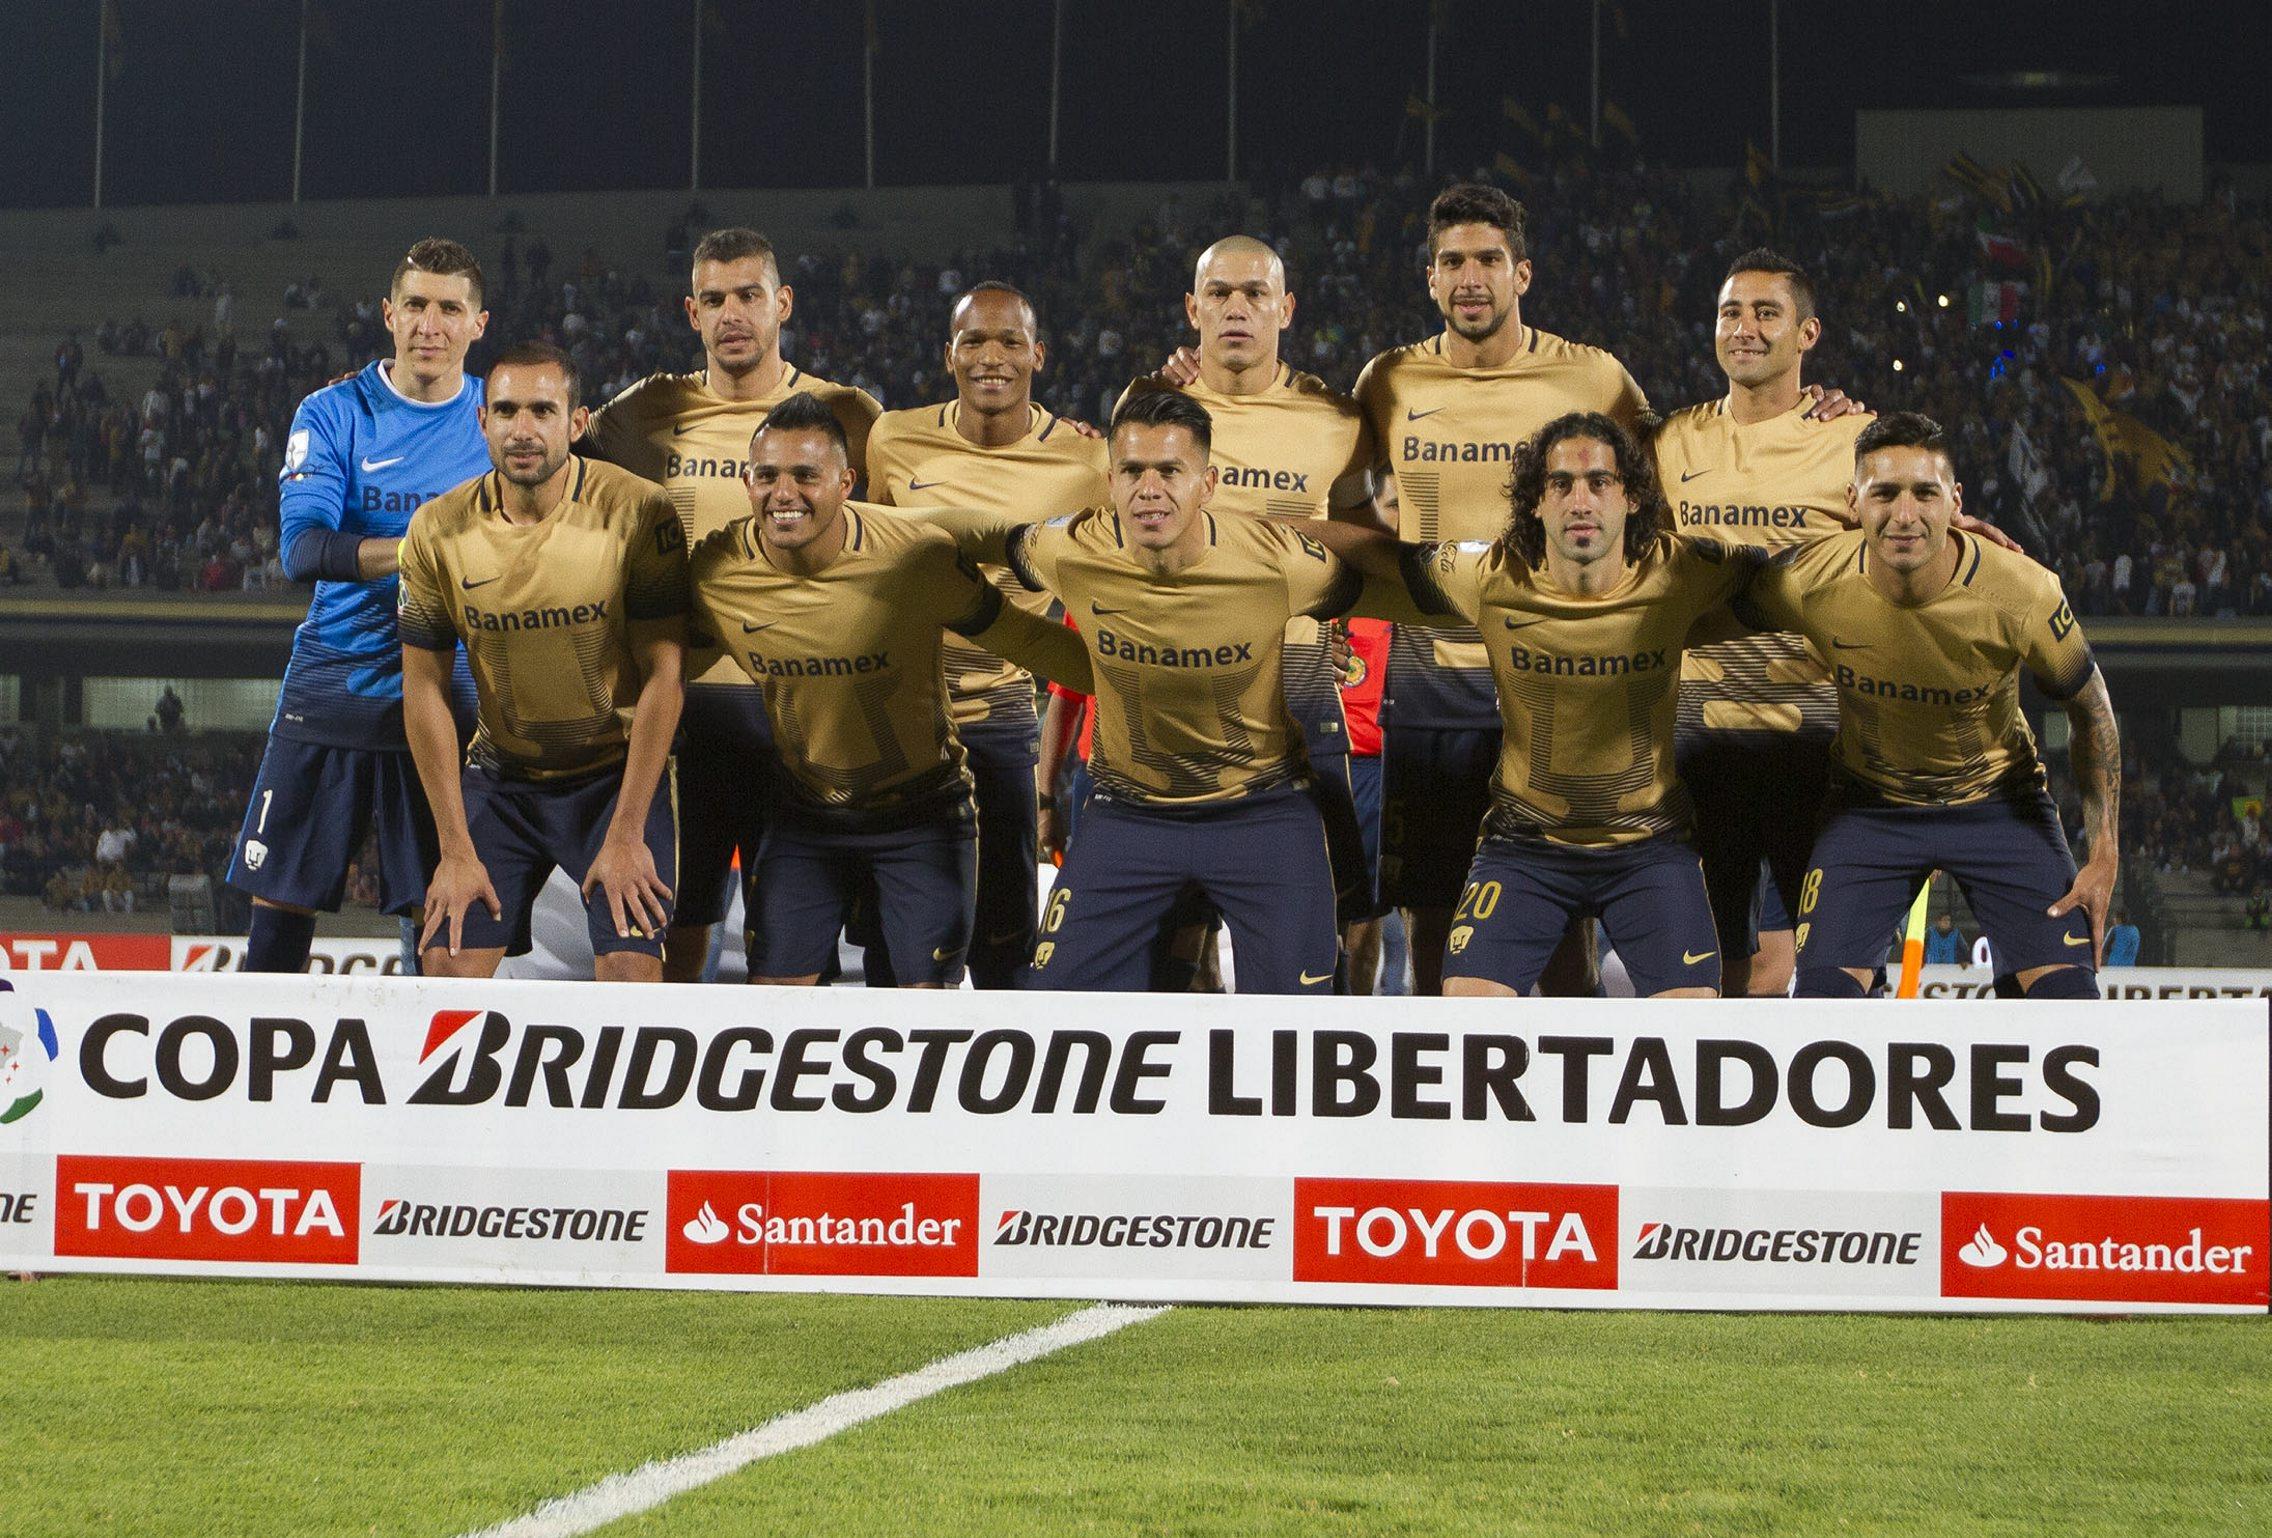 Arranca Pumas la Copa Libertadores con triunfo ante Emelec, de Ecuador